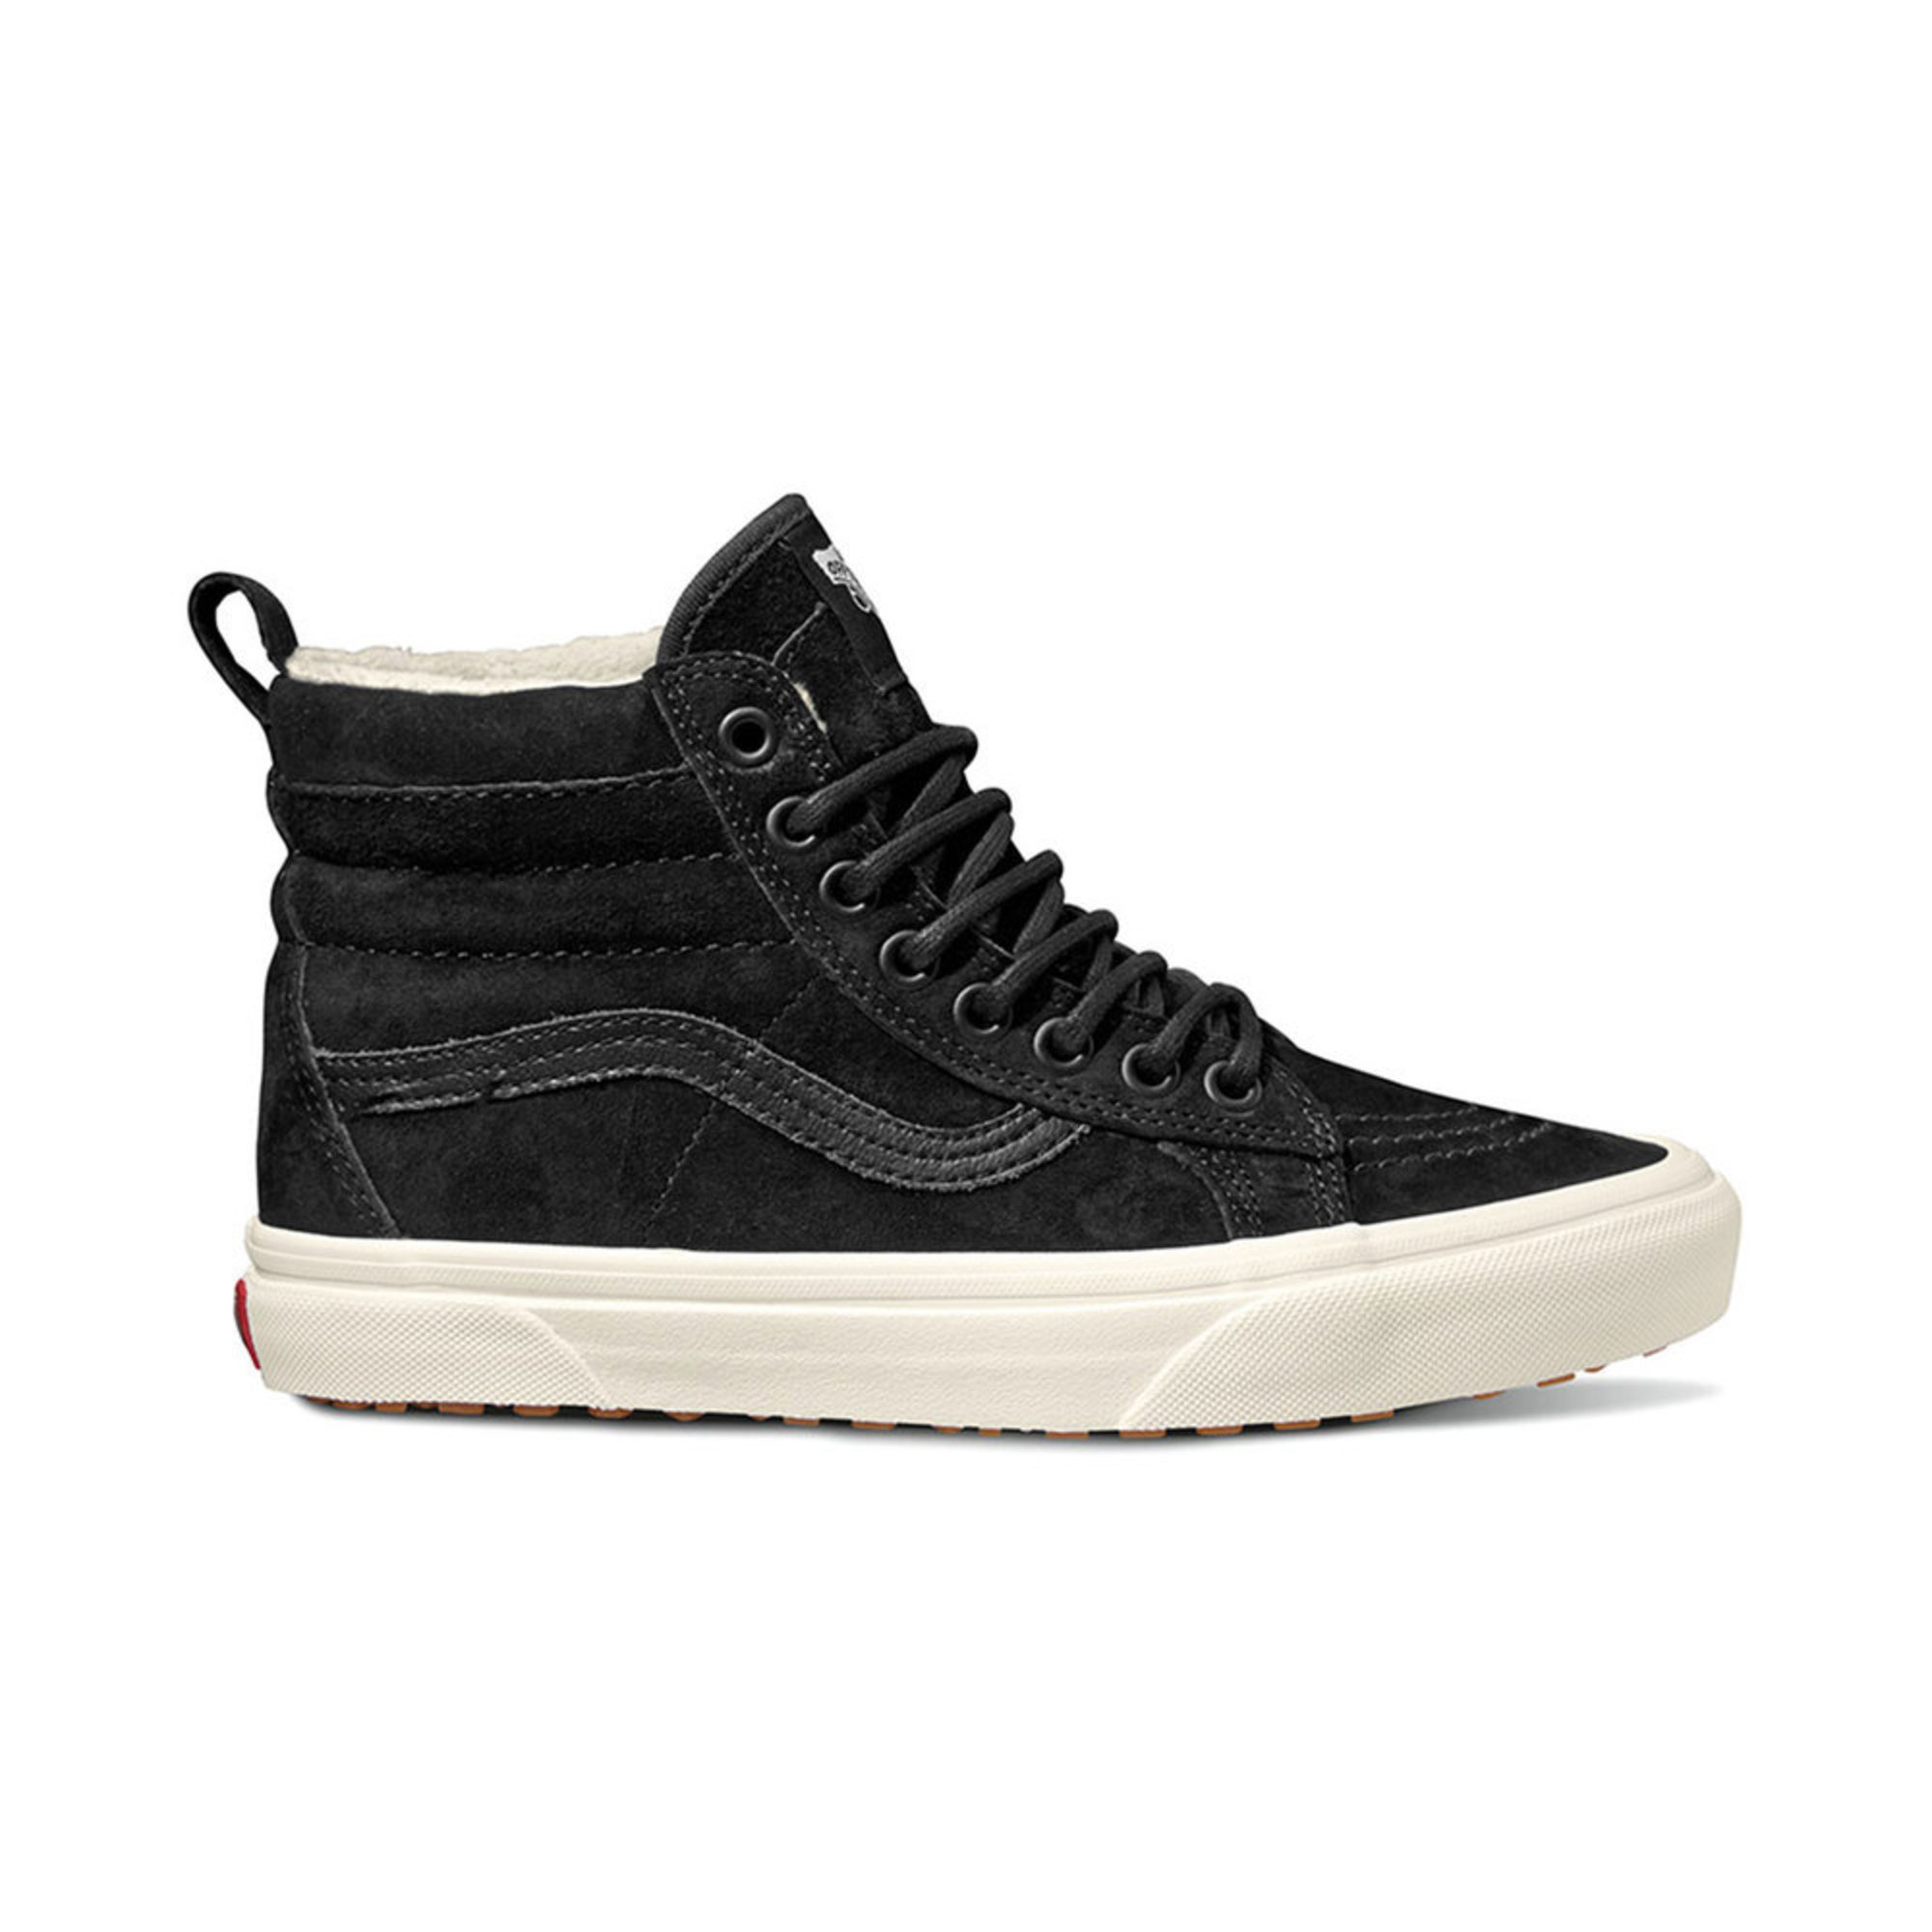 d7c01b498888 Vans Unisex Sk8-hi Mte Skate Shoe